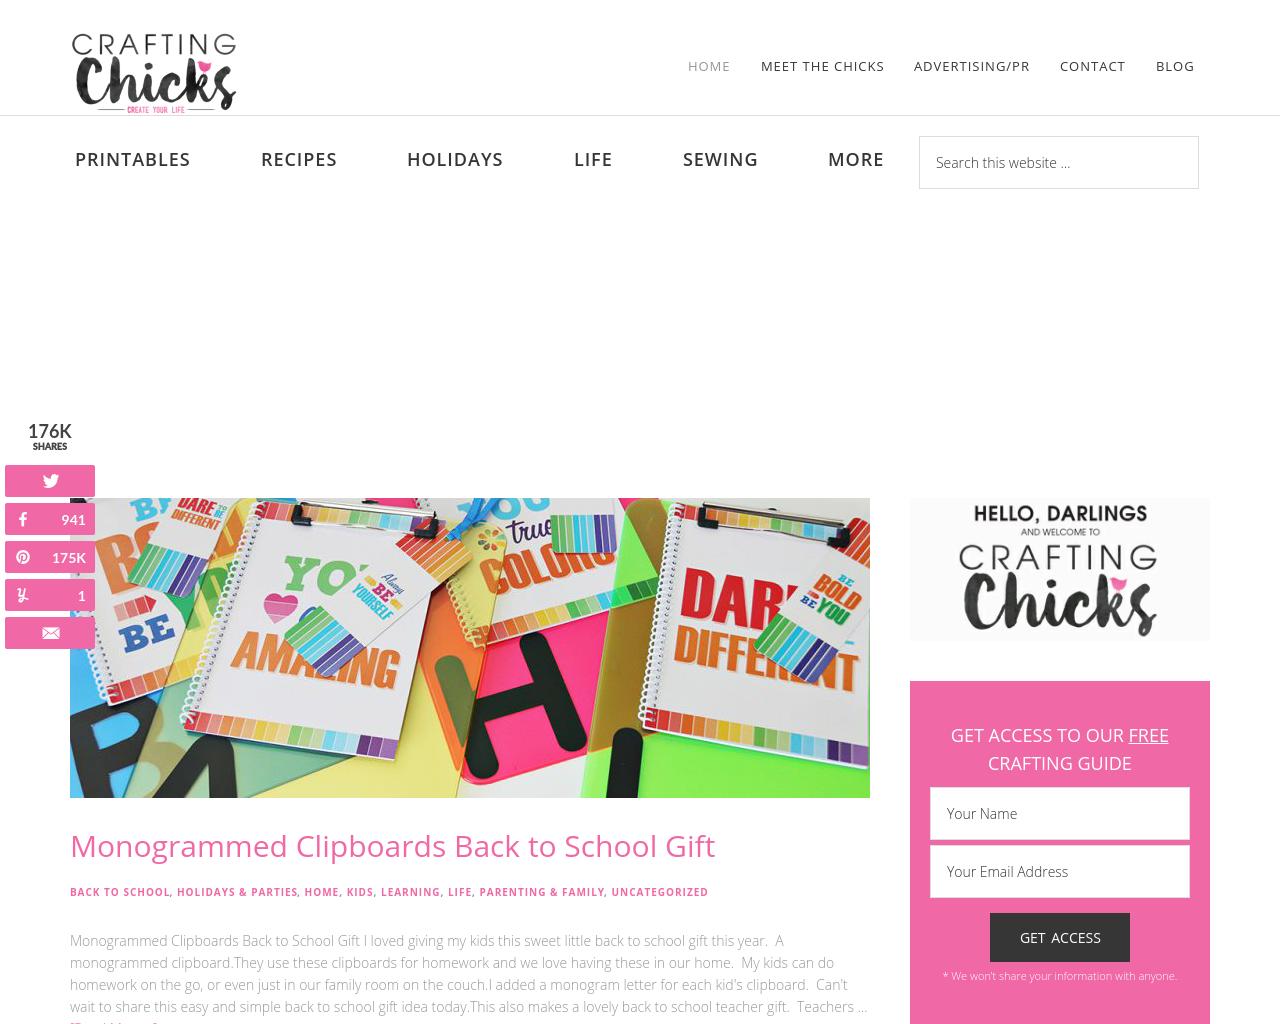 Crafting-Chicks-Advertising-Reviews-Pricing